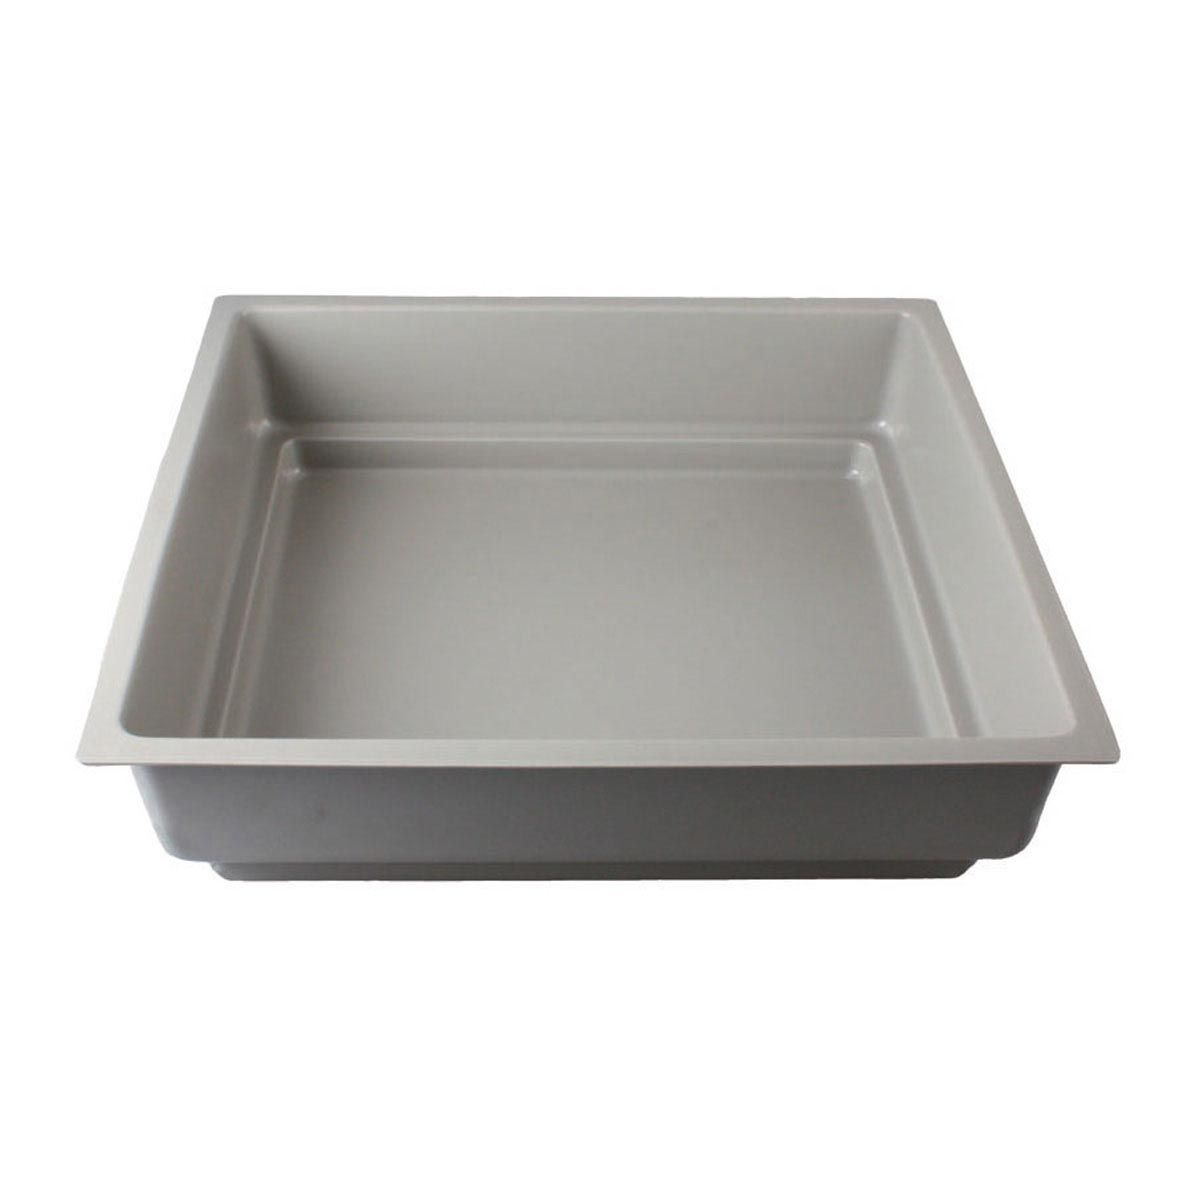 Bac plat, en PS, gris, 595 x 565 x 130 mm